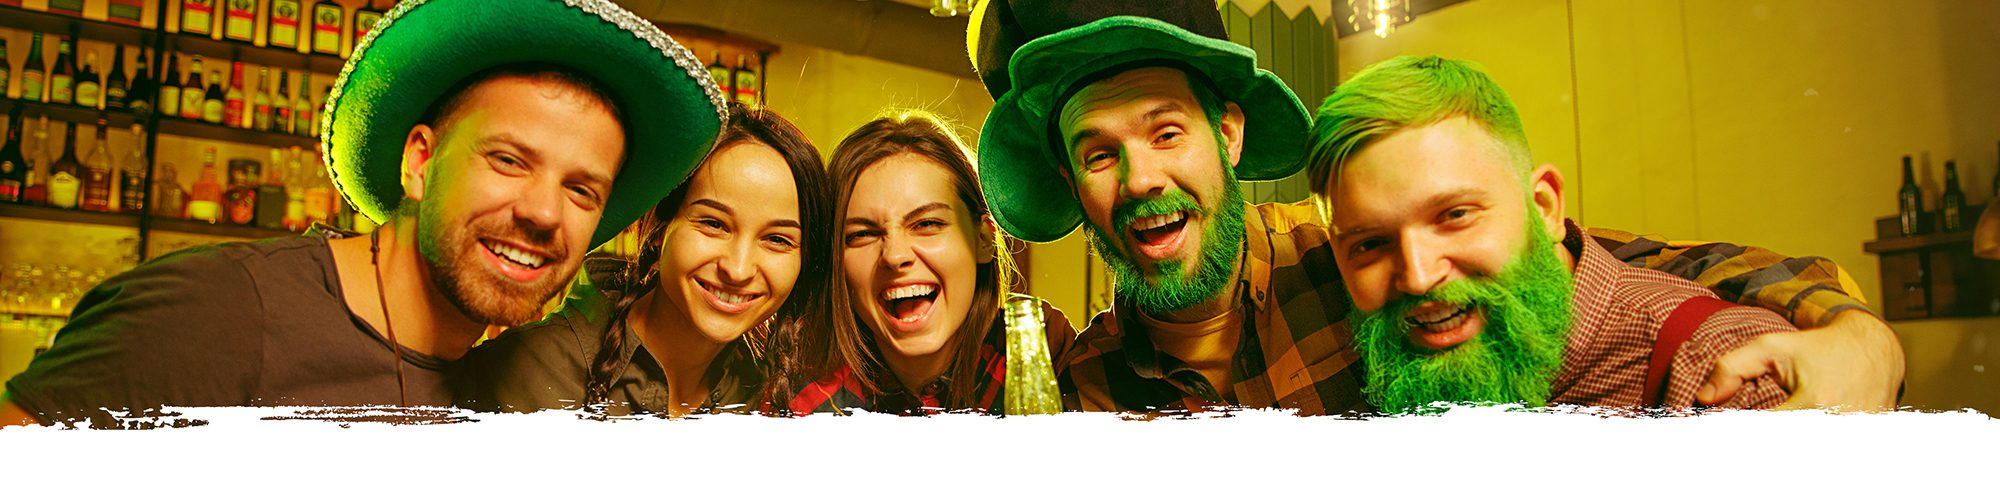 Drinking green beer